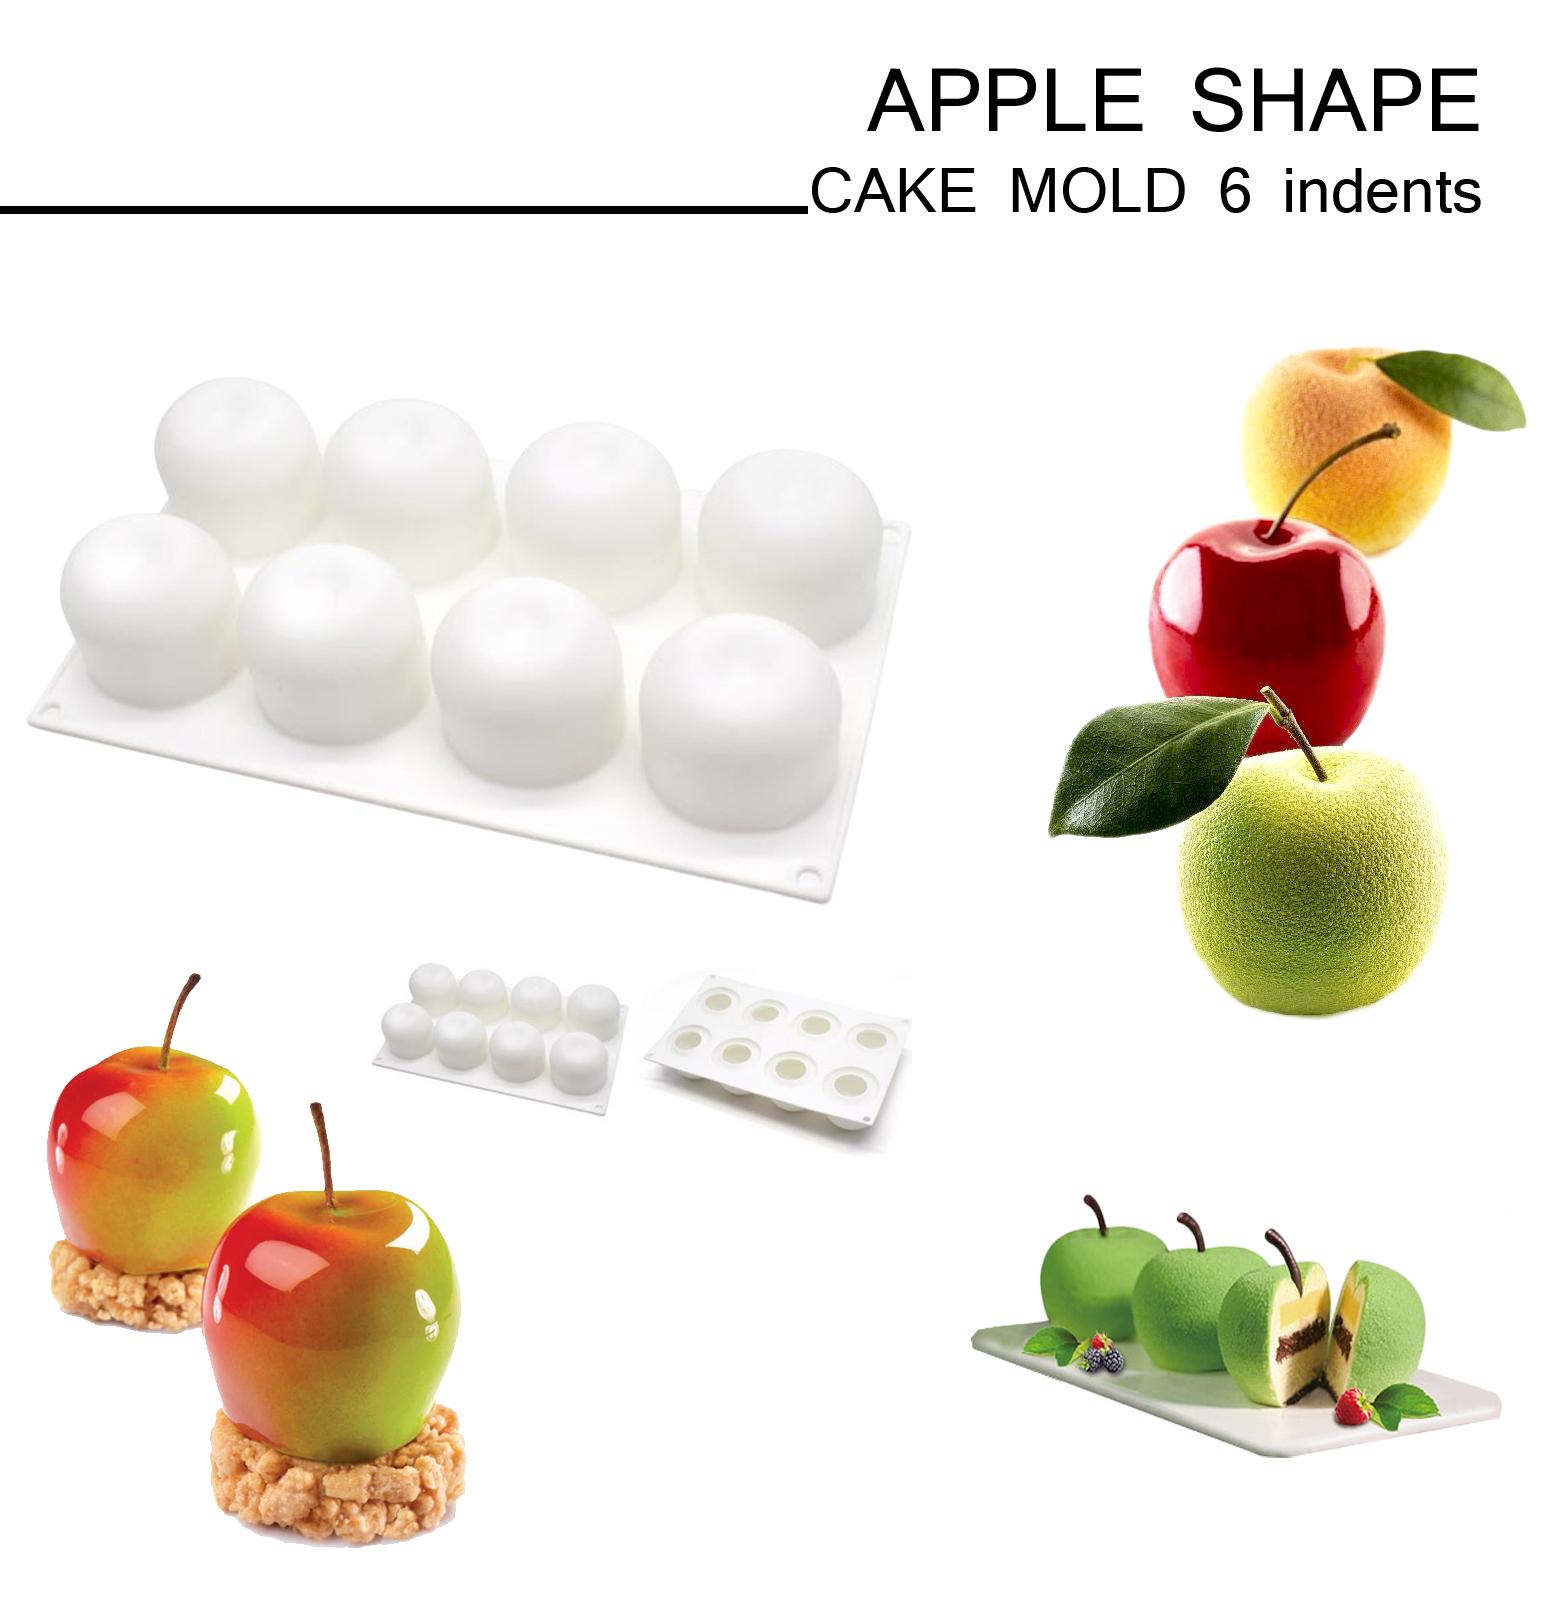 APPLE SHAPE CAKE MOLD 6 indents